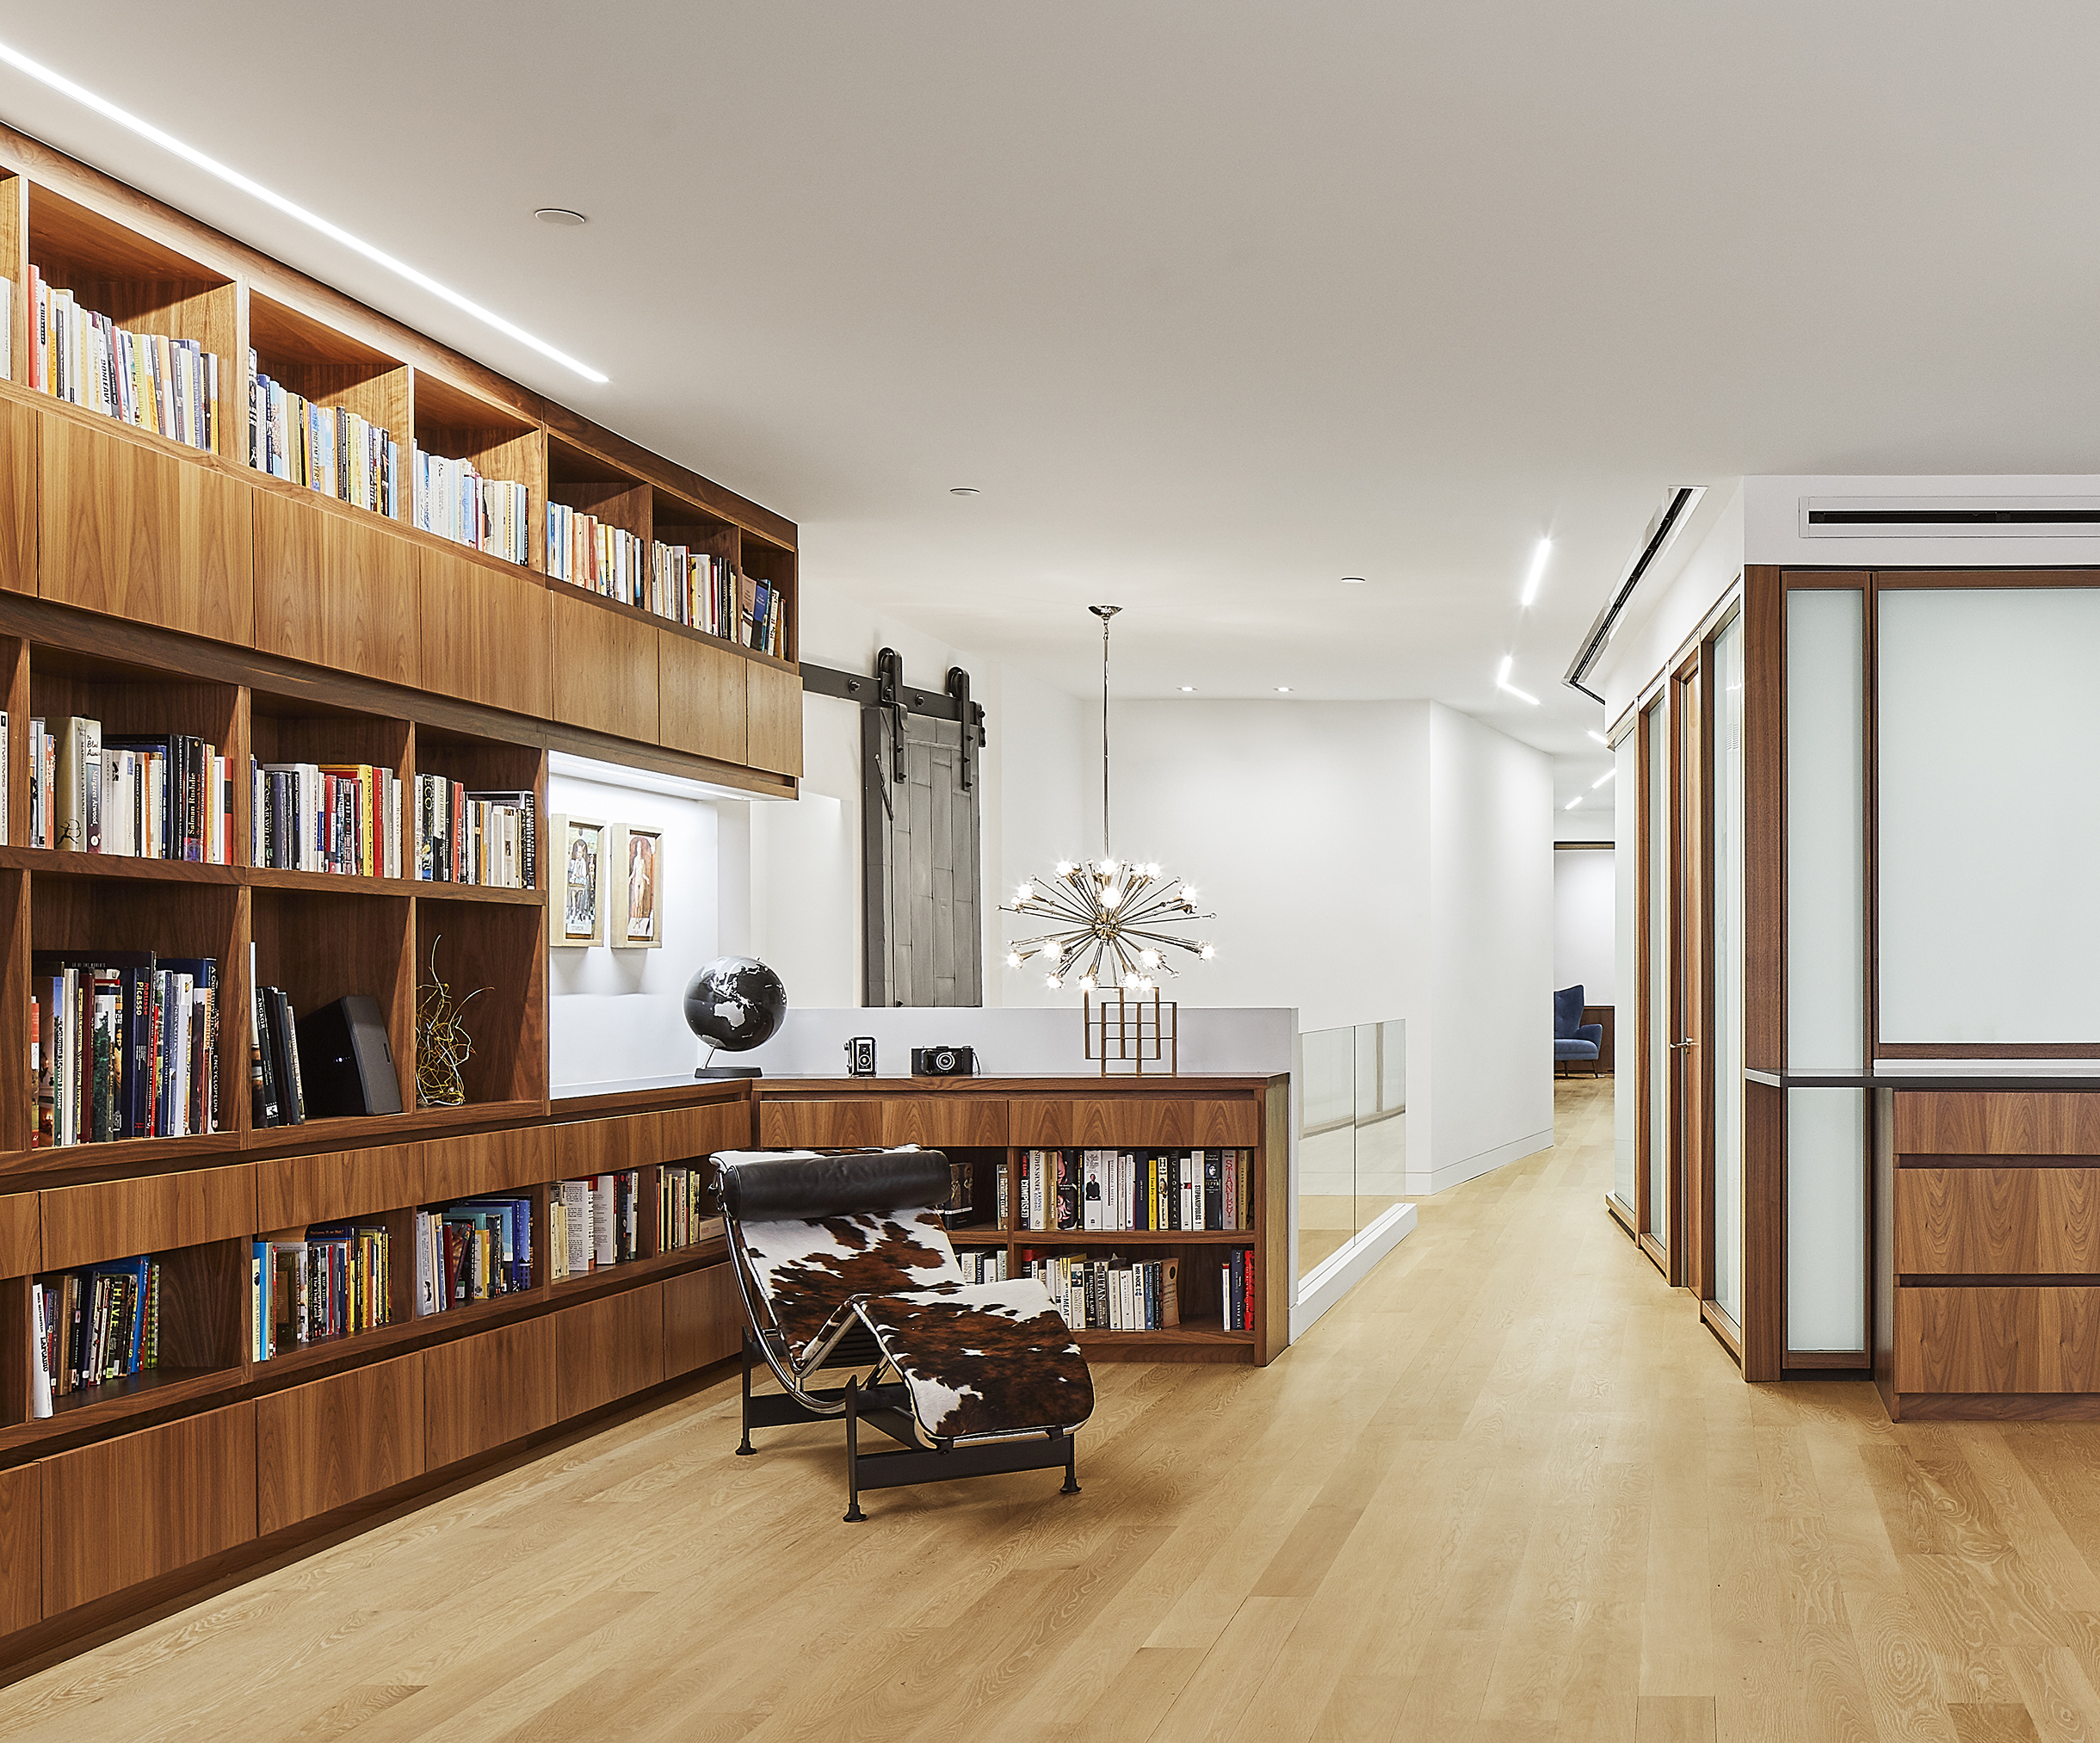 turkel_design_modern_prefab_home_soho_loft_living_room_storage_shelving.jpg